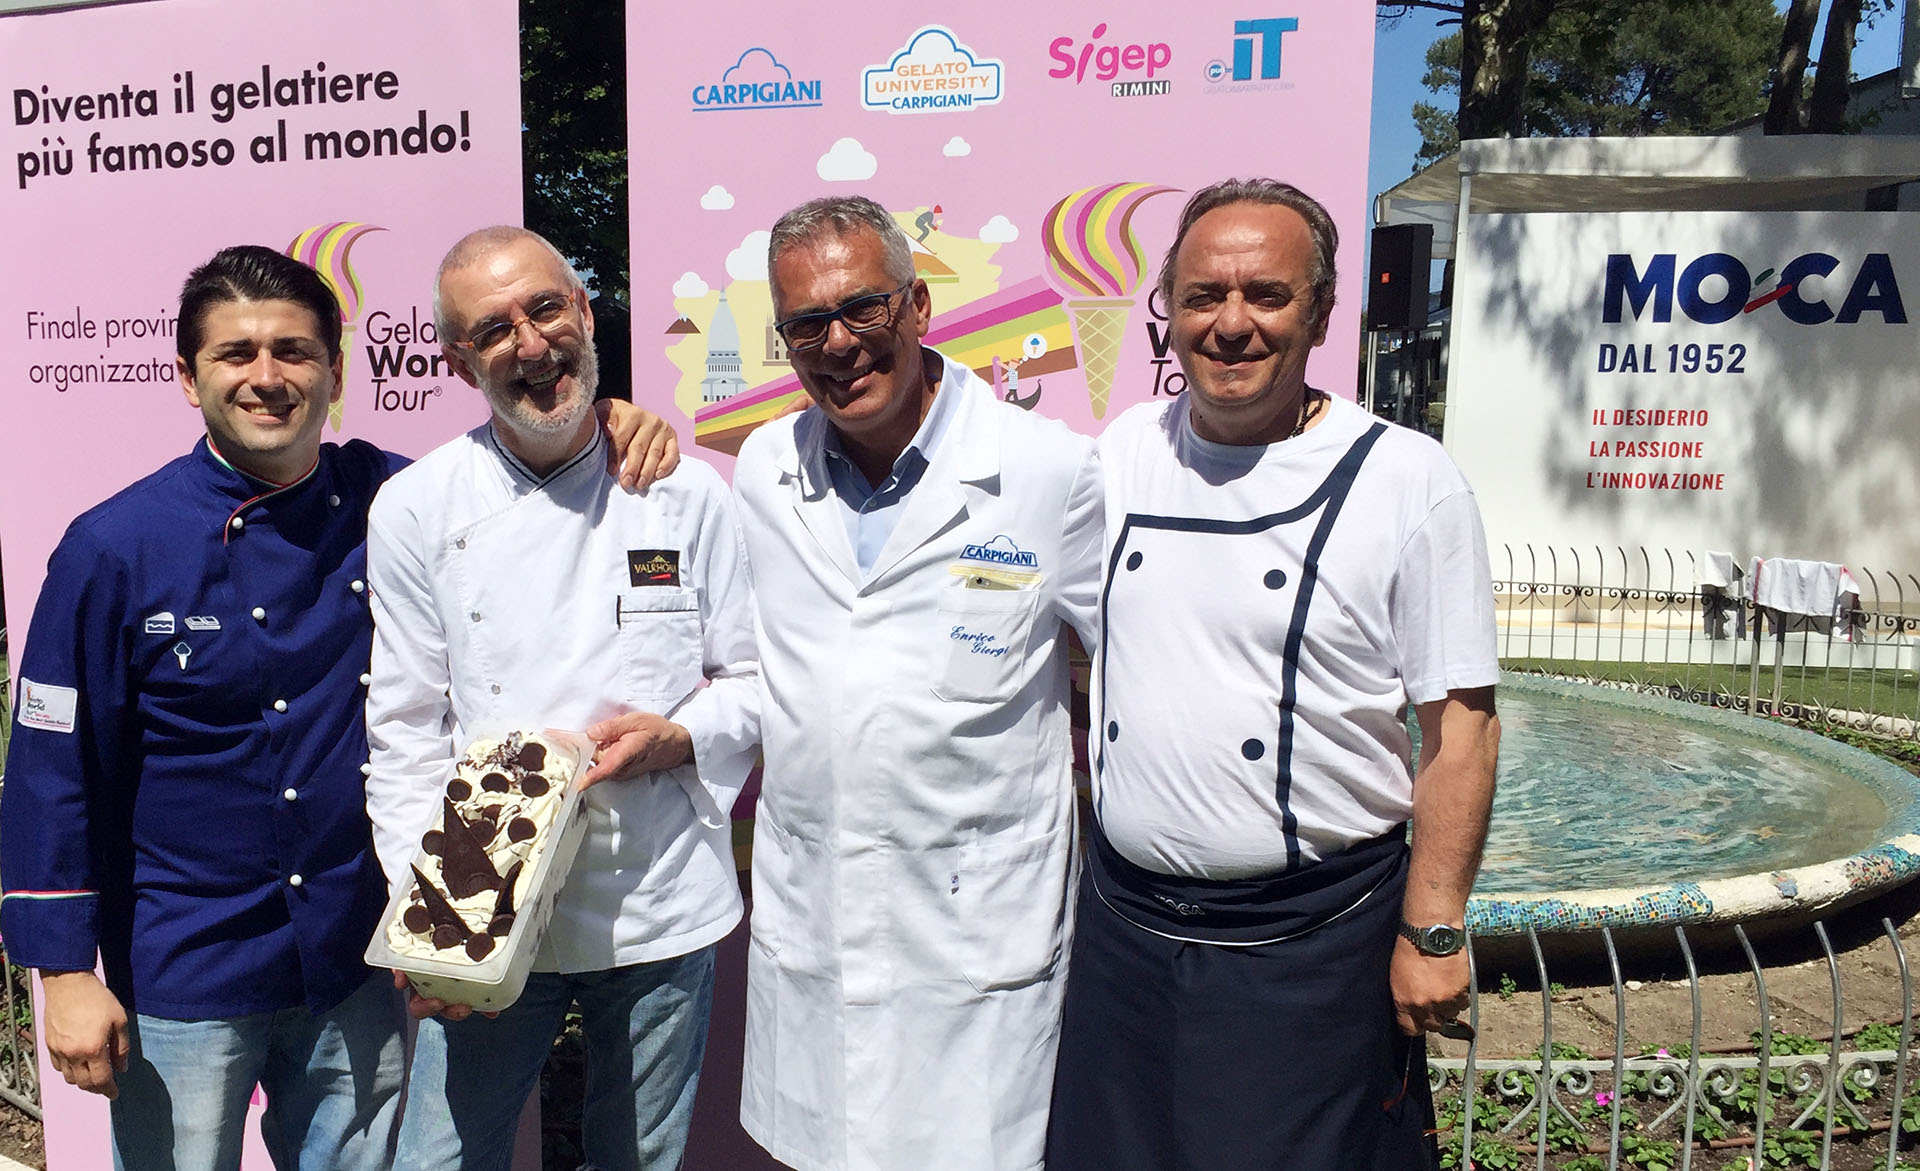 gelato-world-tour-rimini-2016